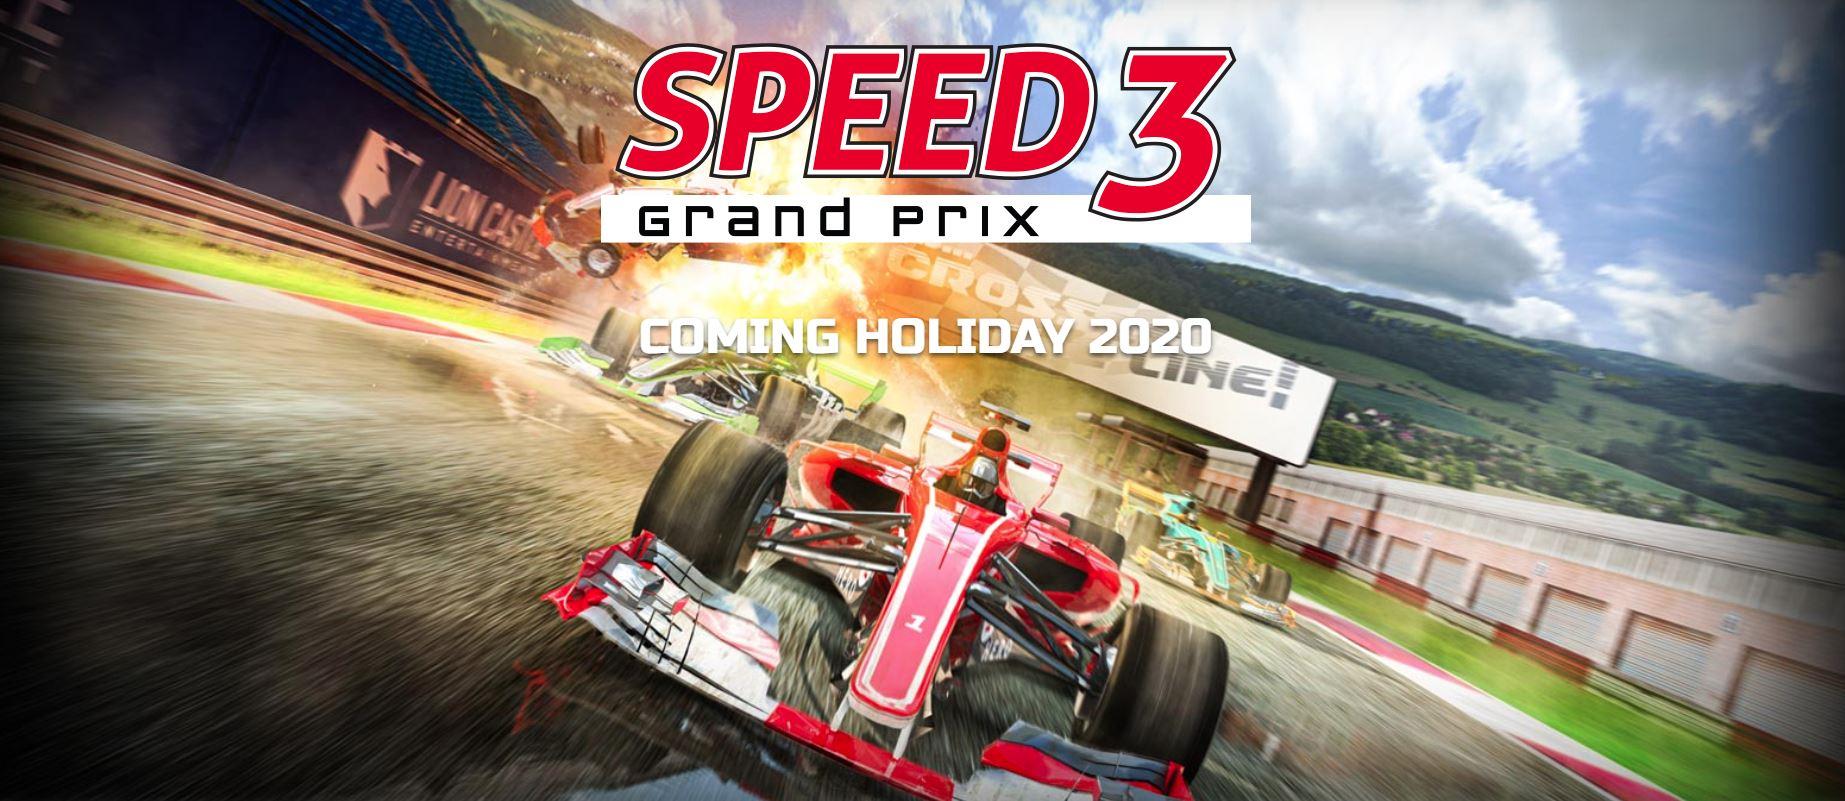 speed 3 grand